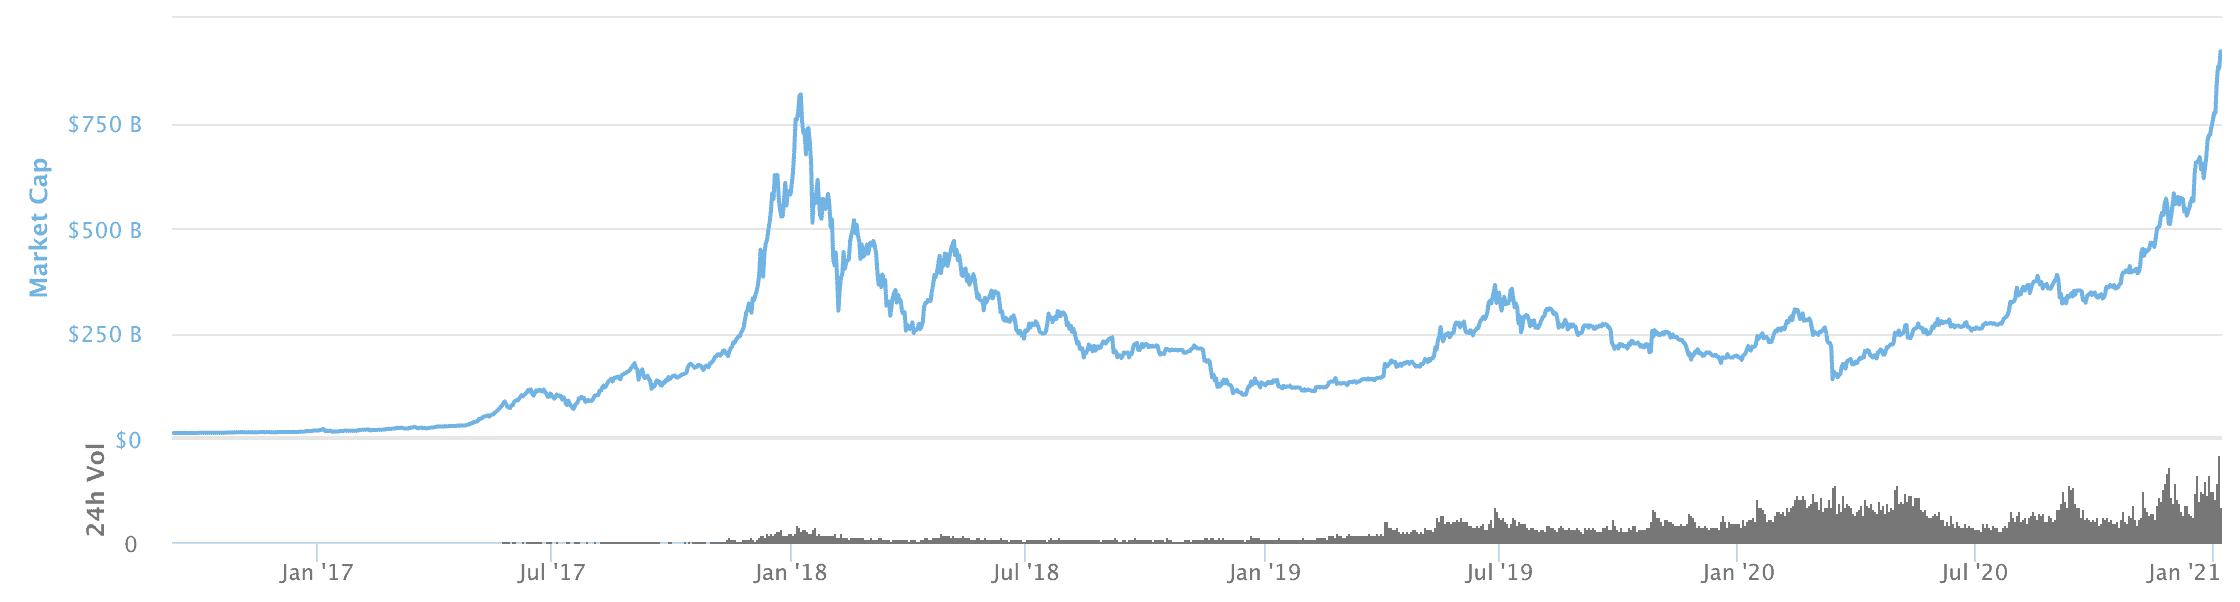 The global crypto market cap, Jan 2021